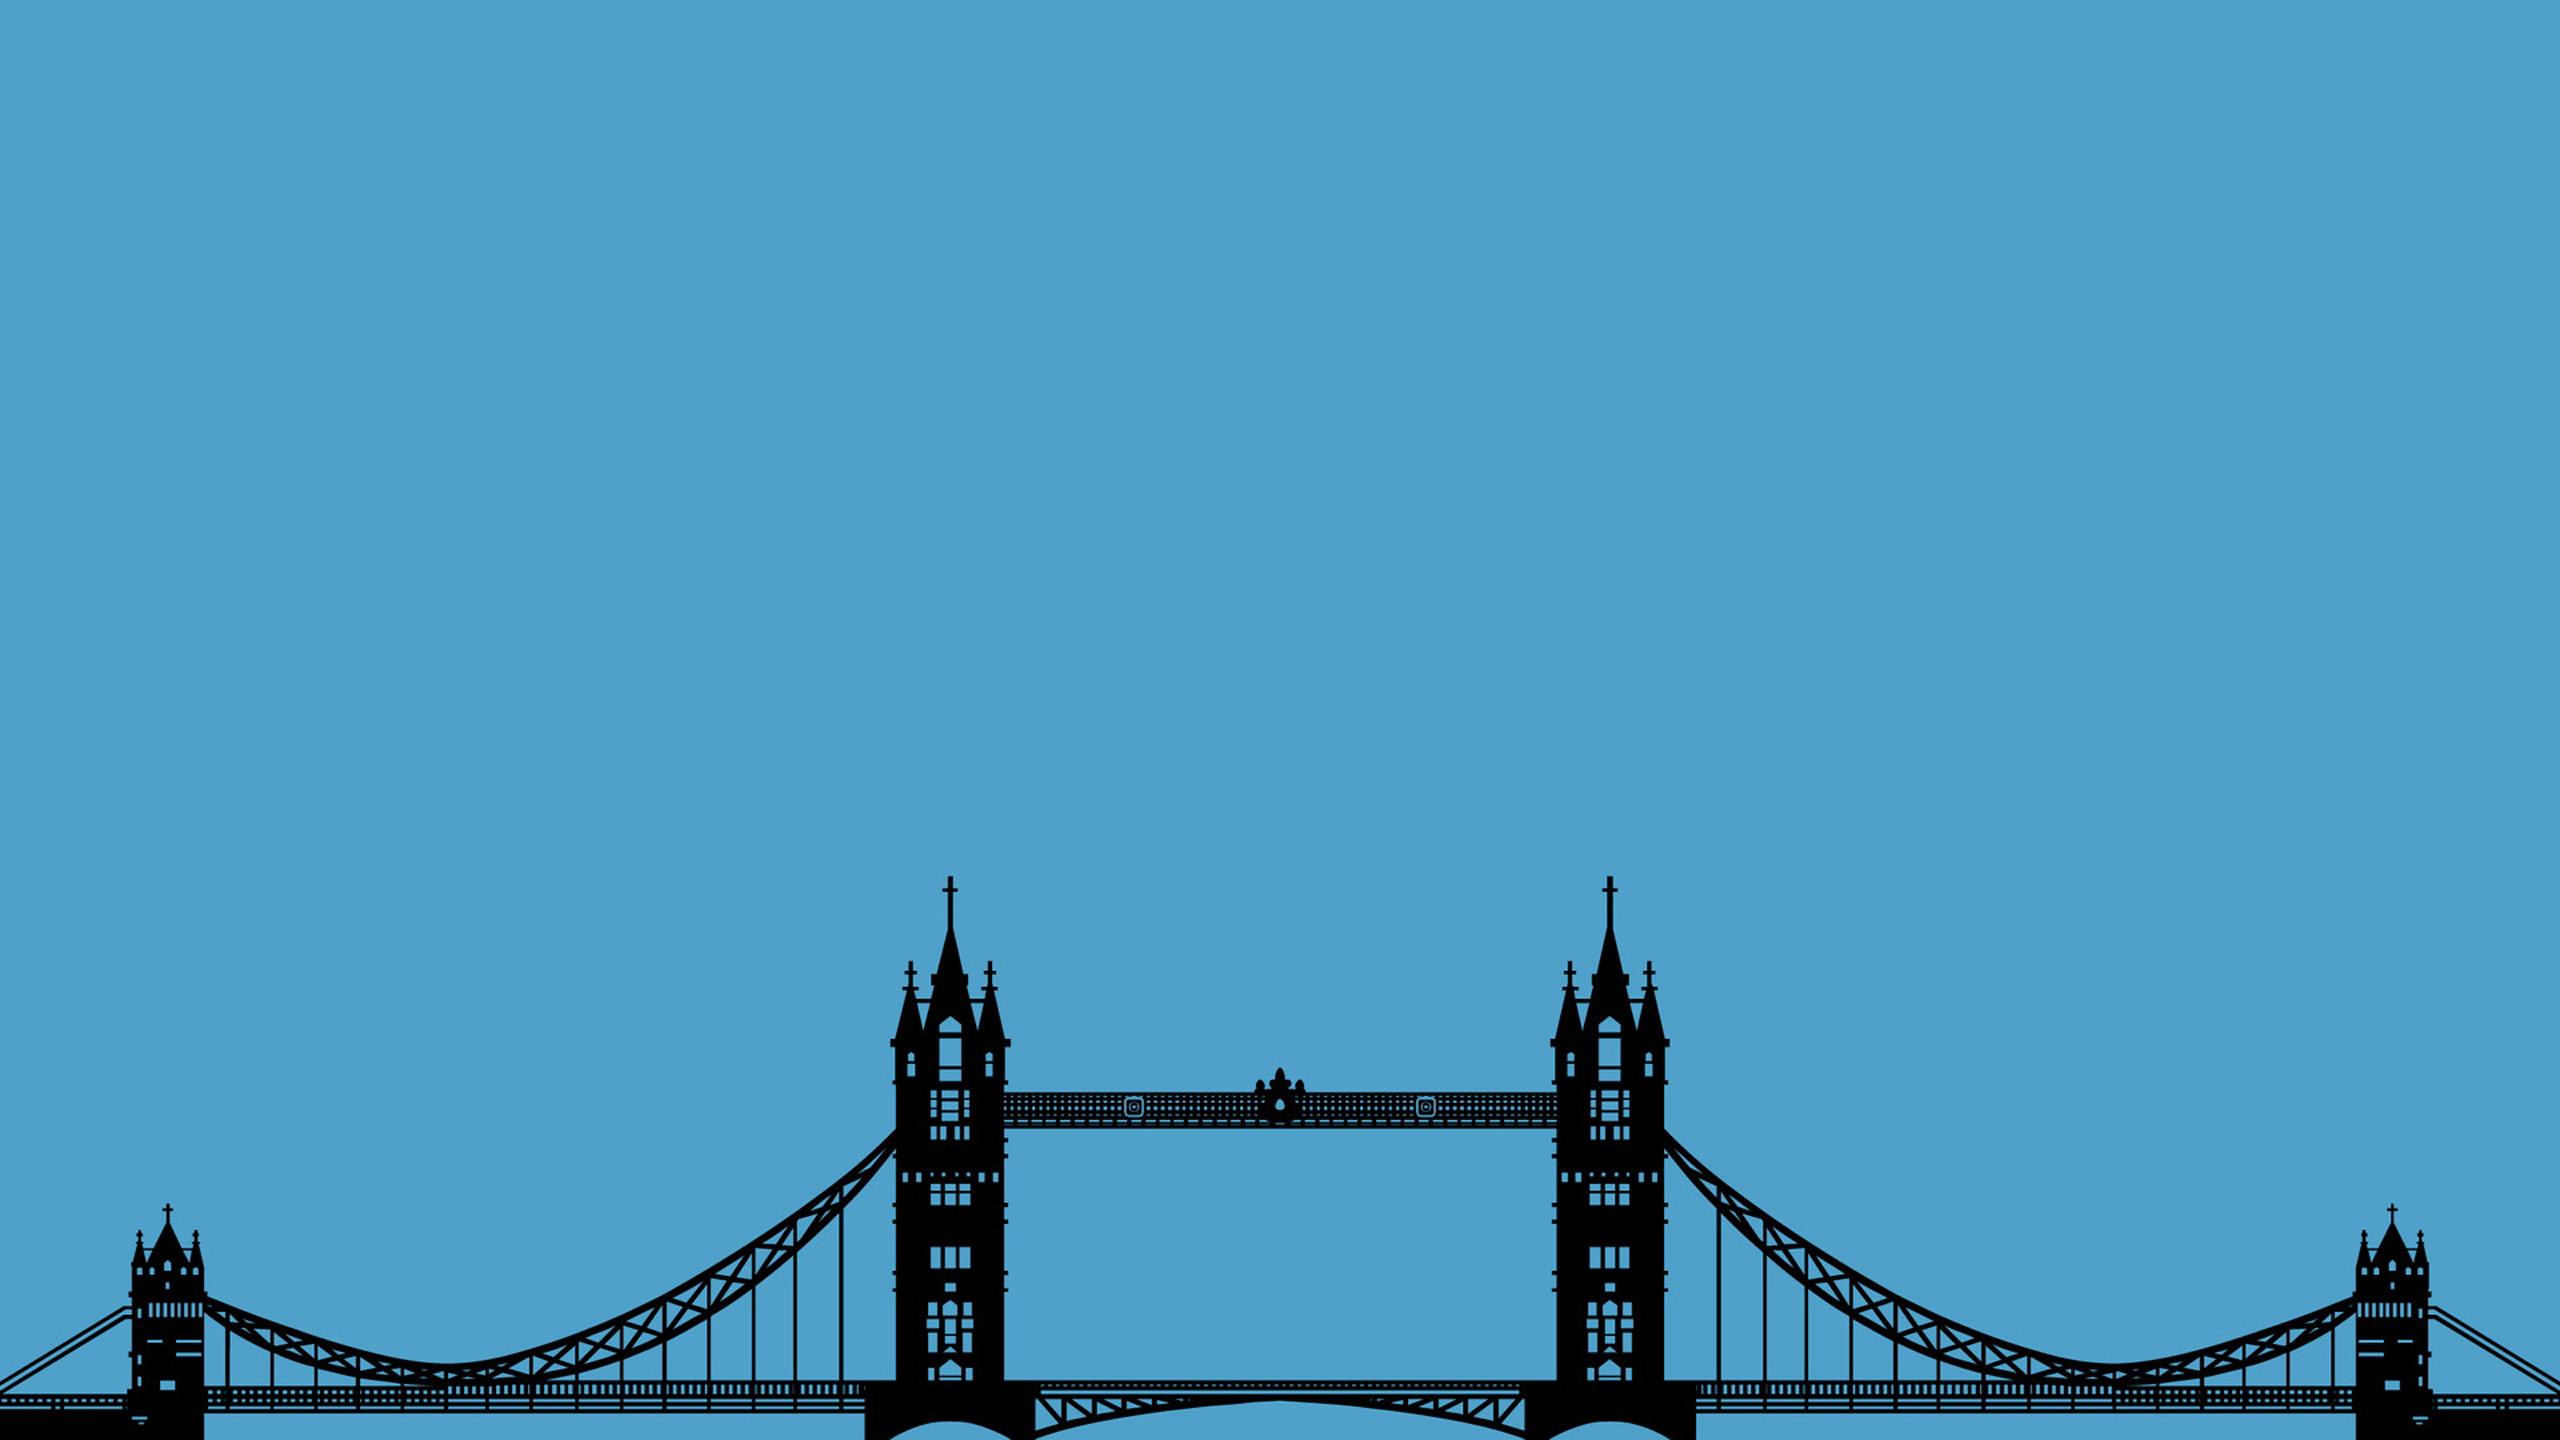 minimalist bridge wallpaper background 59193